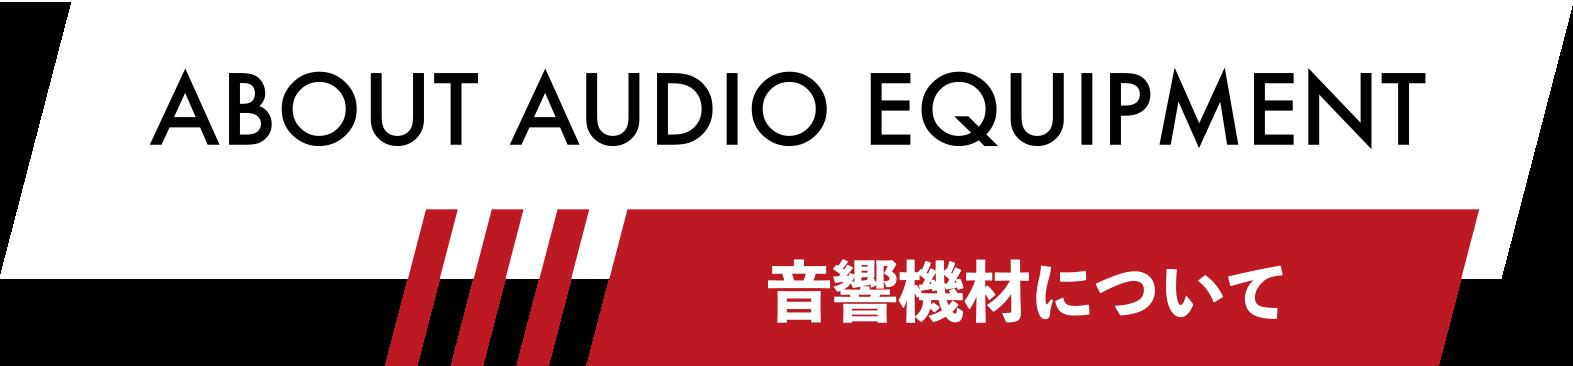 ABOUT AUDIO EQUIPMENT 音響機材について